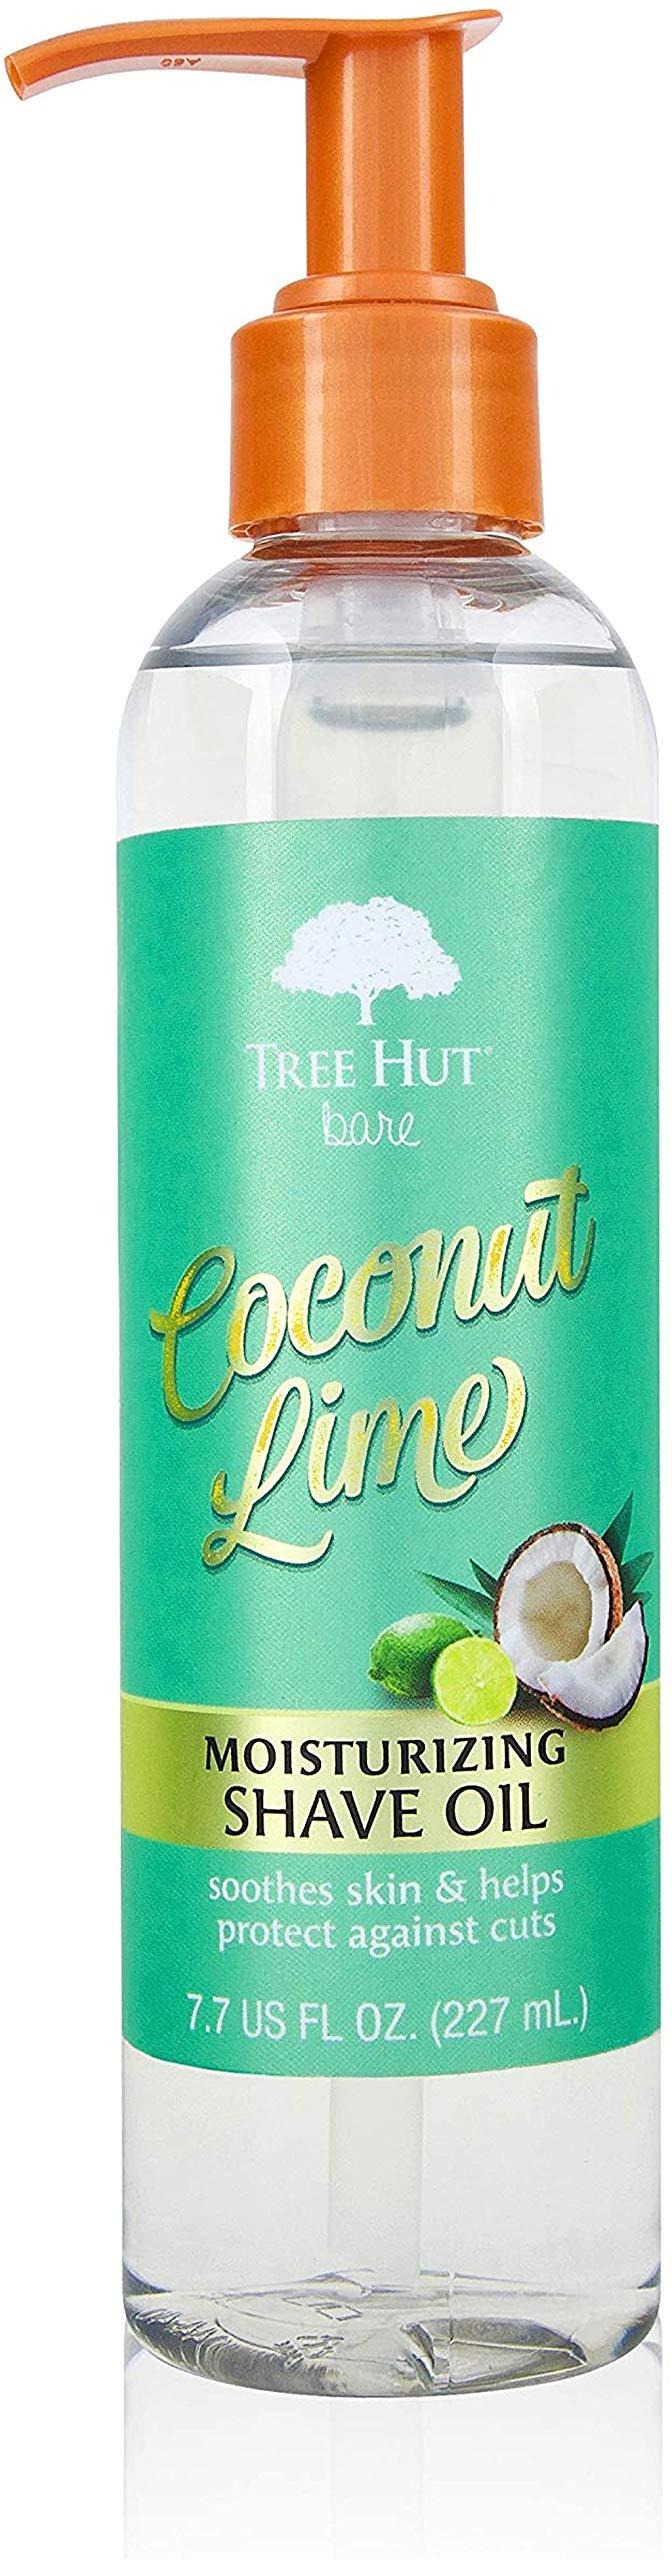 Tree Hut bare Moisturizing Shave Oil, Basic, Coconut-Lime, 7.7 Fl Oz